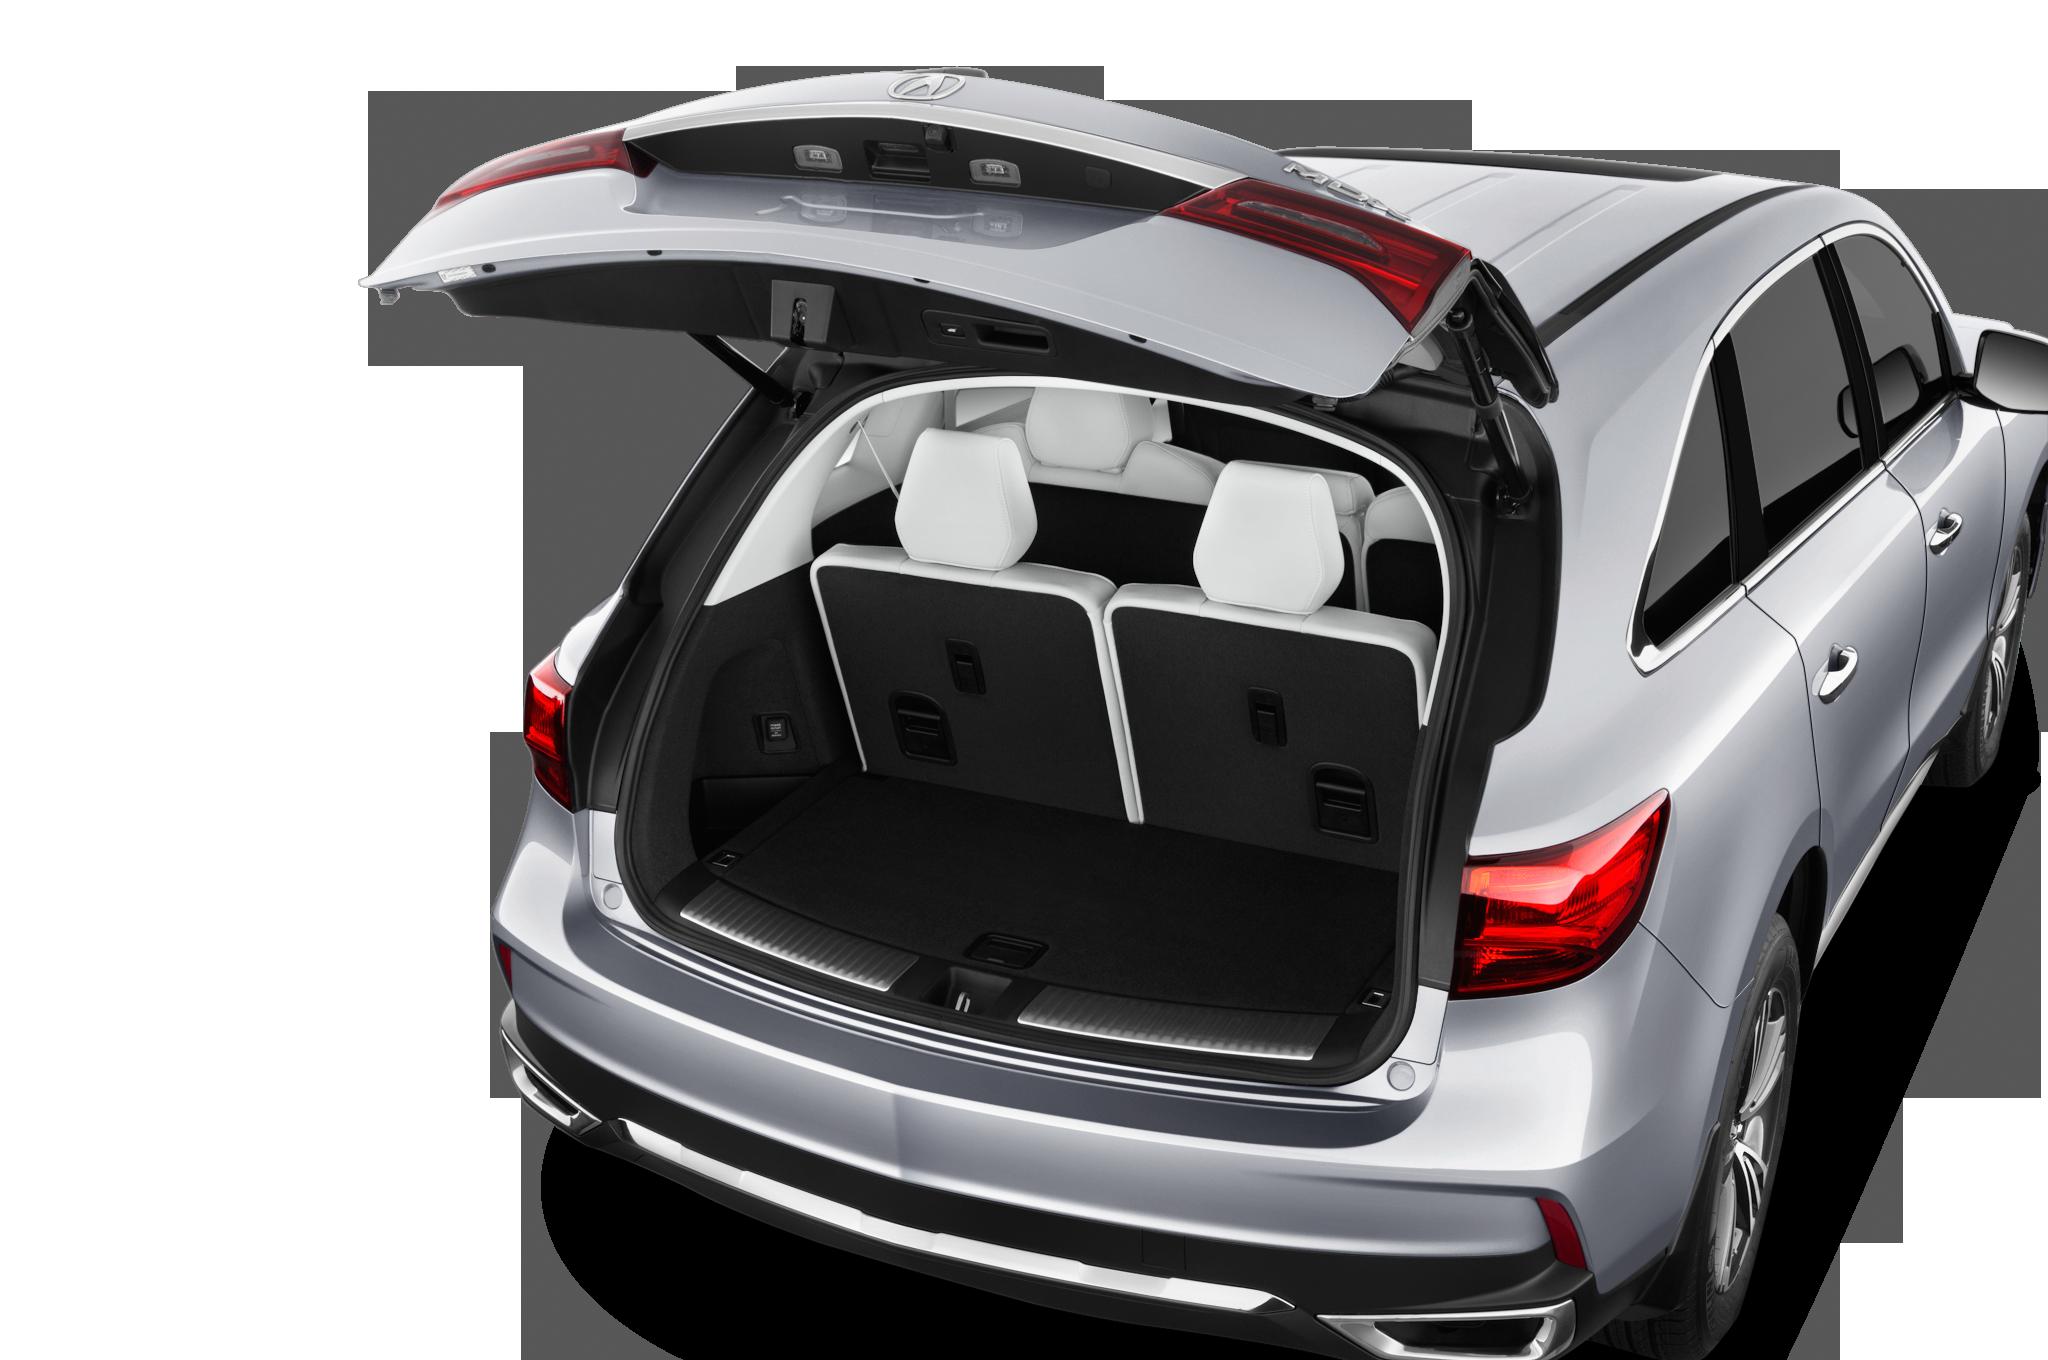 2017 acura mdx debuts new nose sport hybrid model for new york automobile magazine. Black Bedroom Furniture Sets. Home Design Ideas